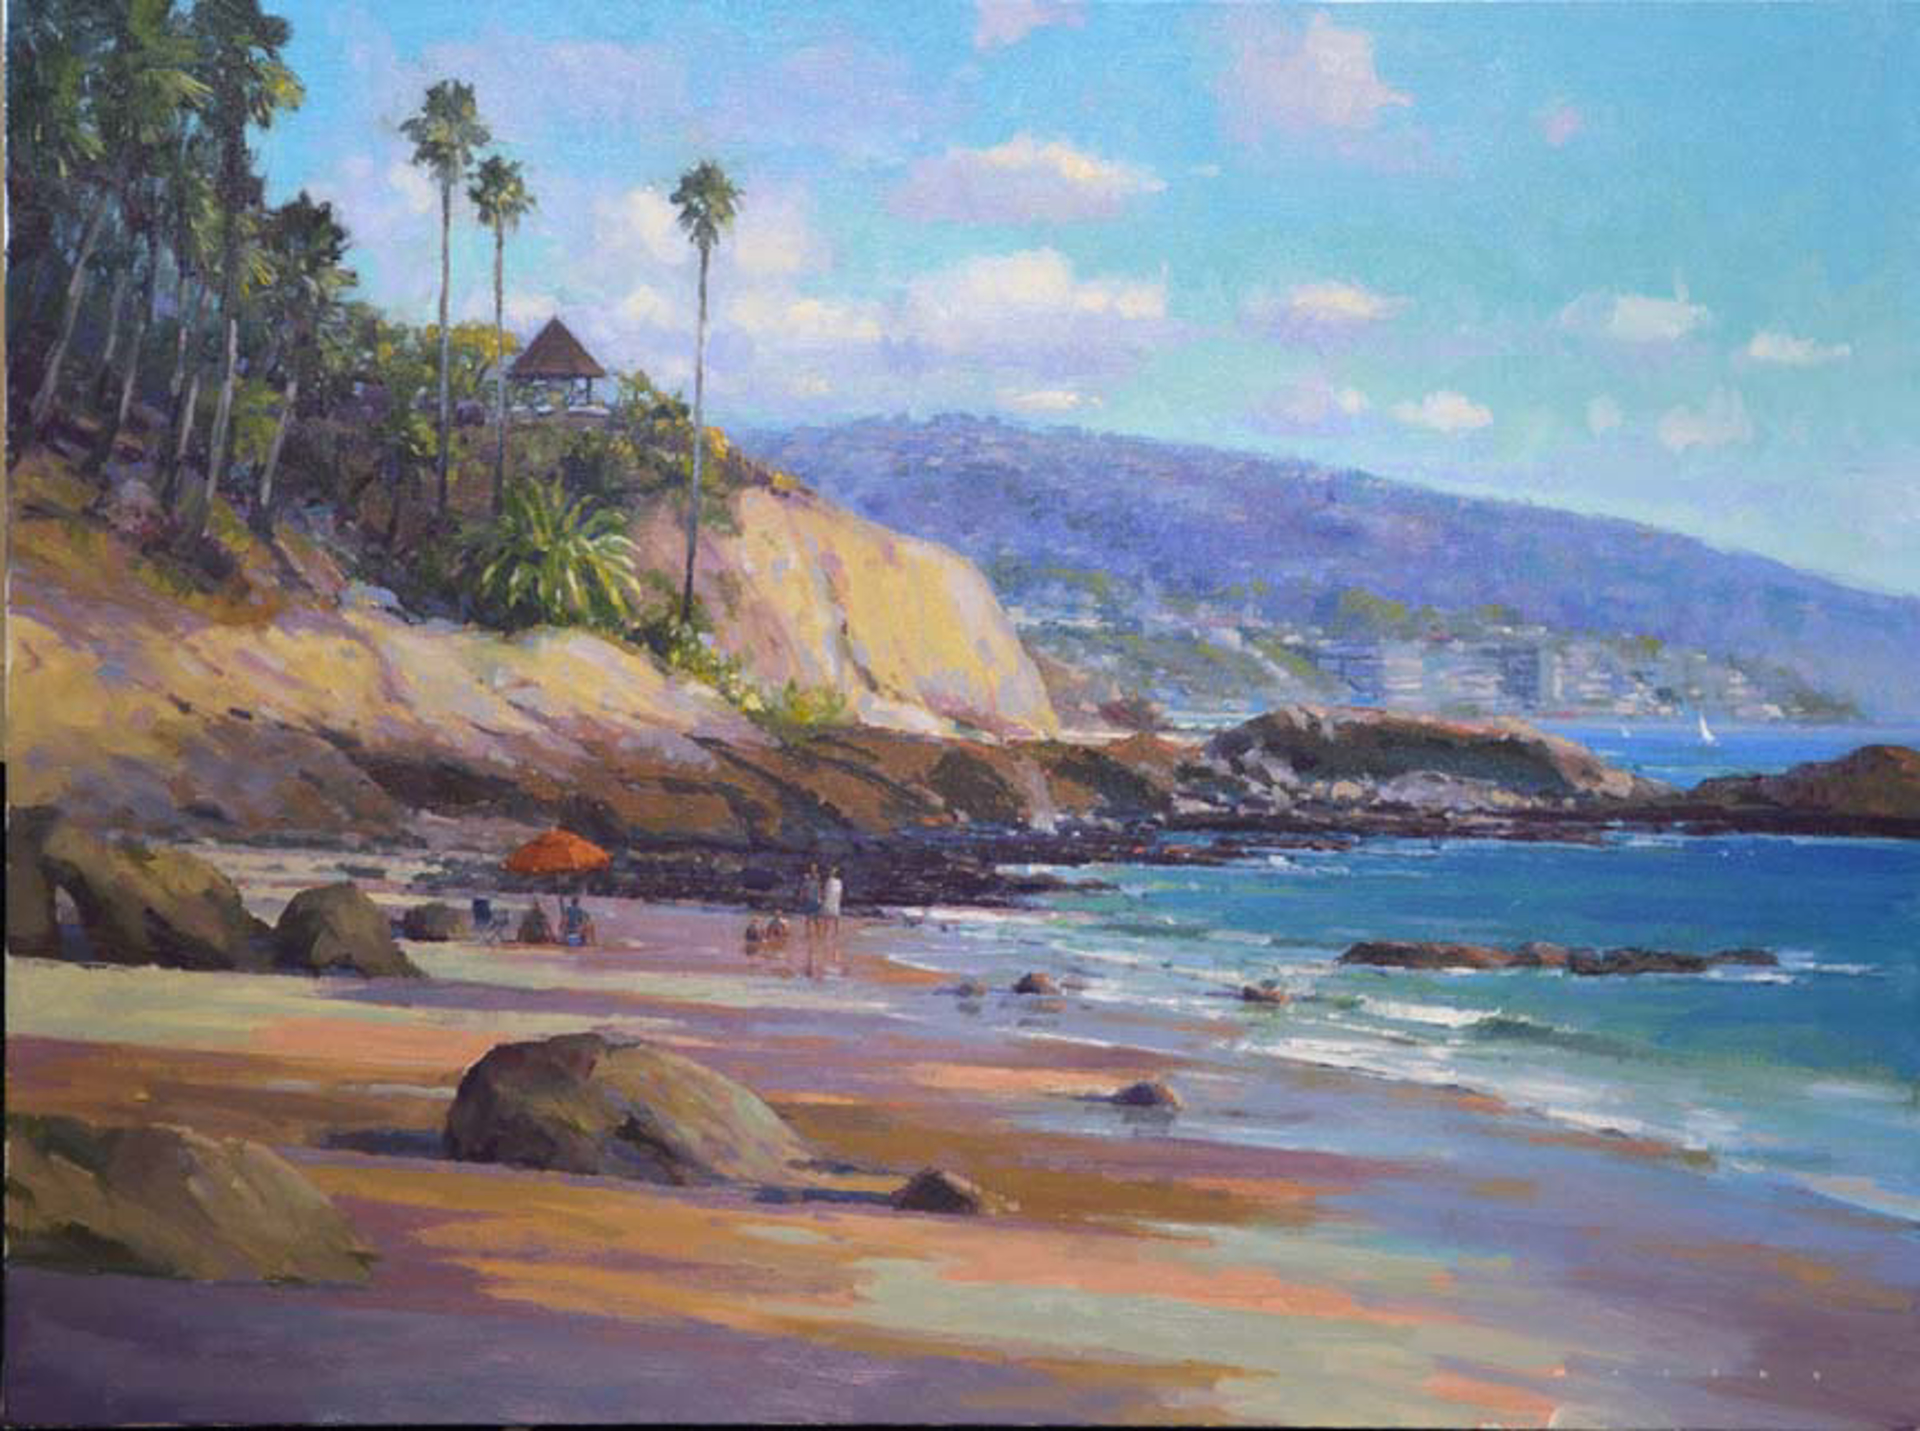 Lovely Laguna Day by Ronaldo Macedo